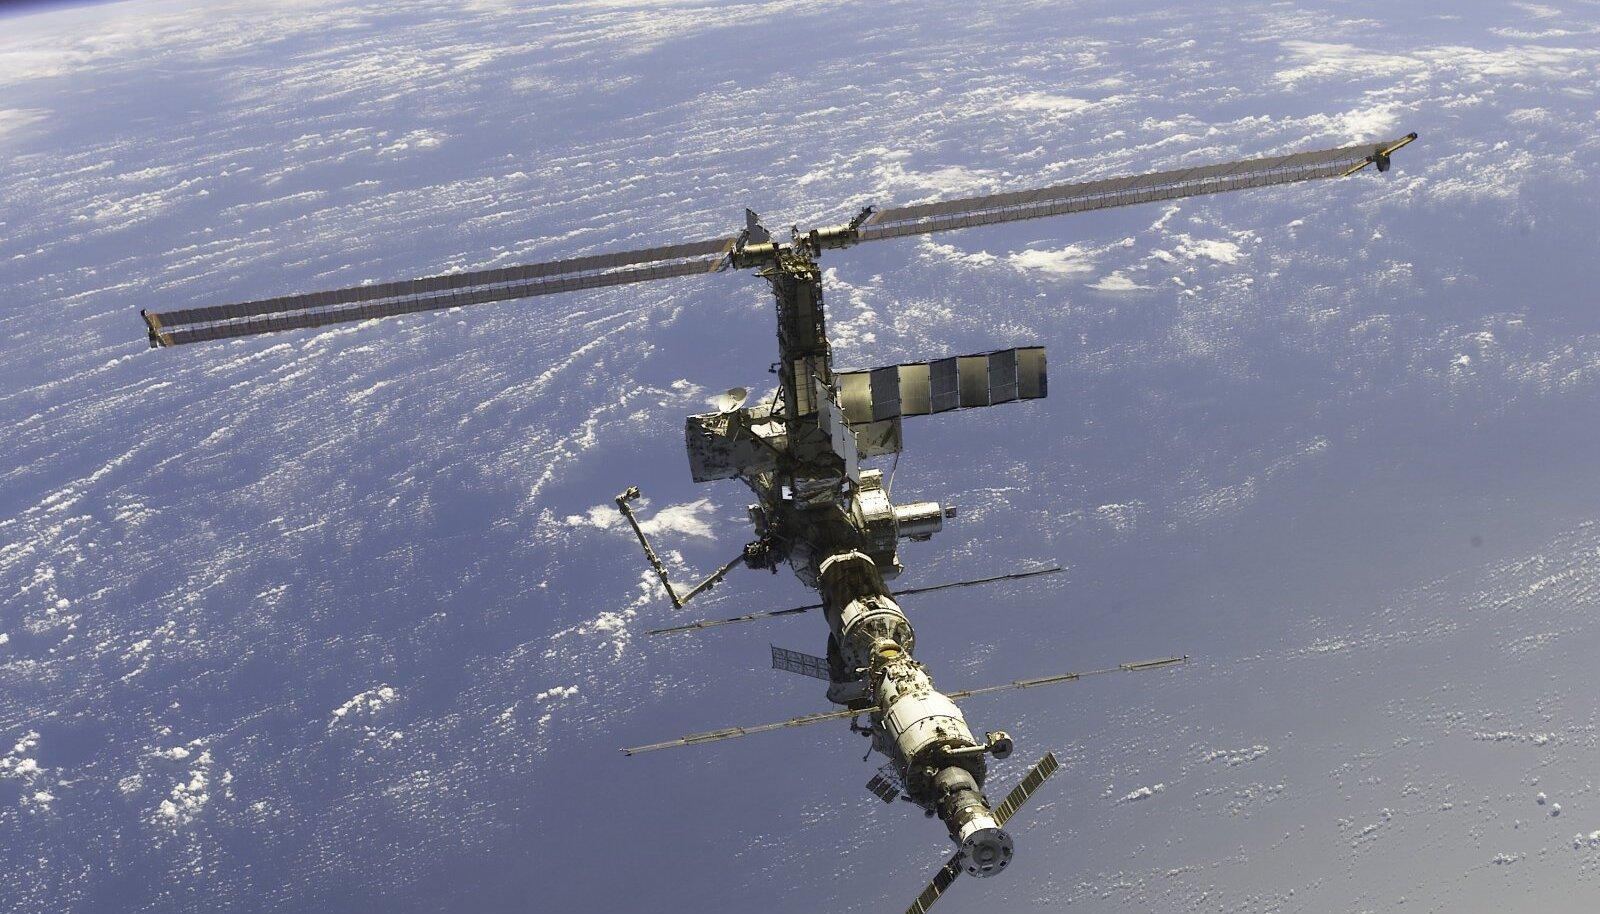 Foto: Wikimedia Commons / NASA, vabakasutuseks